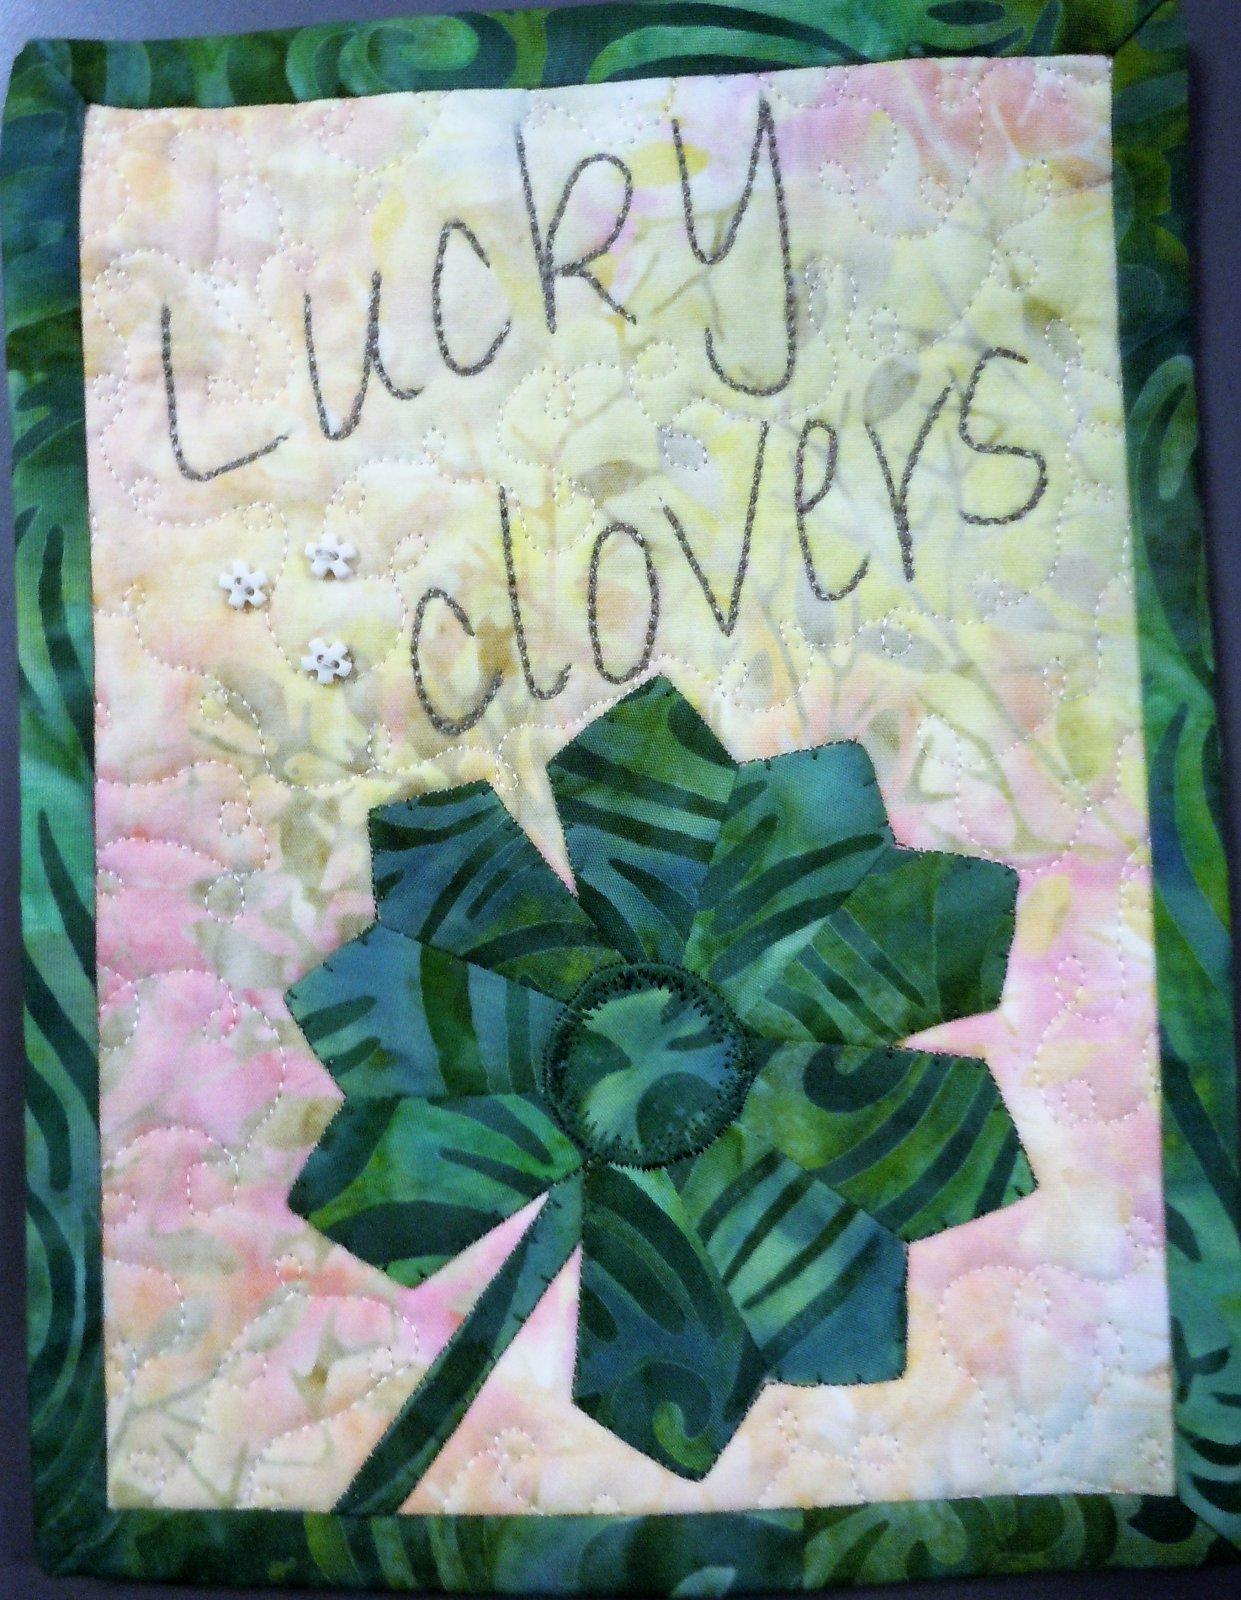 Kit-Tiny Dresden Mar Lucky Clovers 6W x 8H